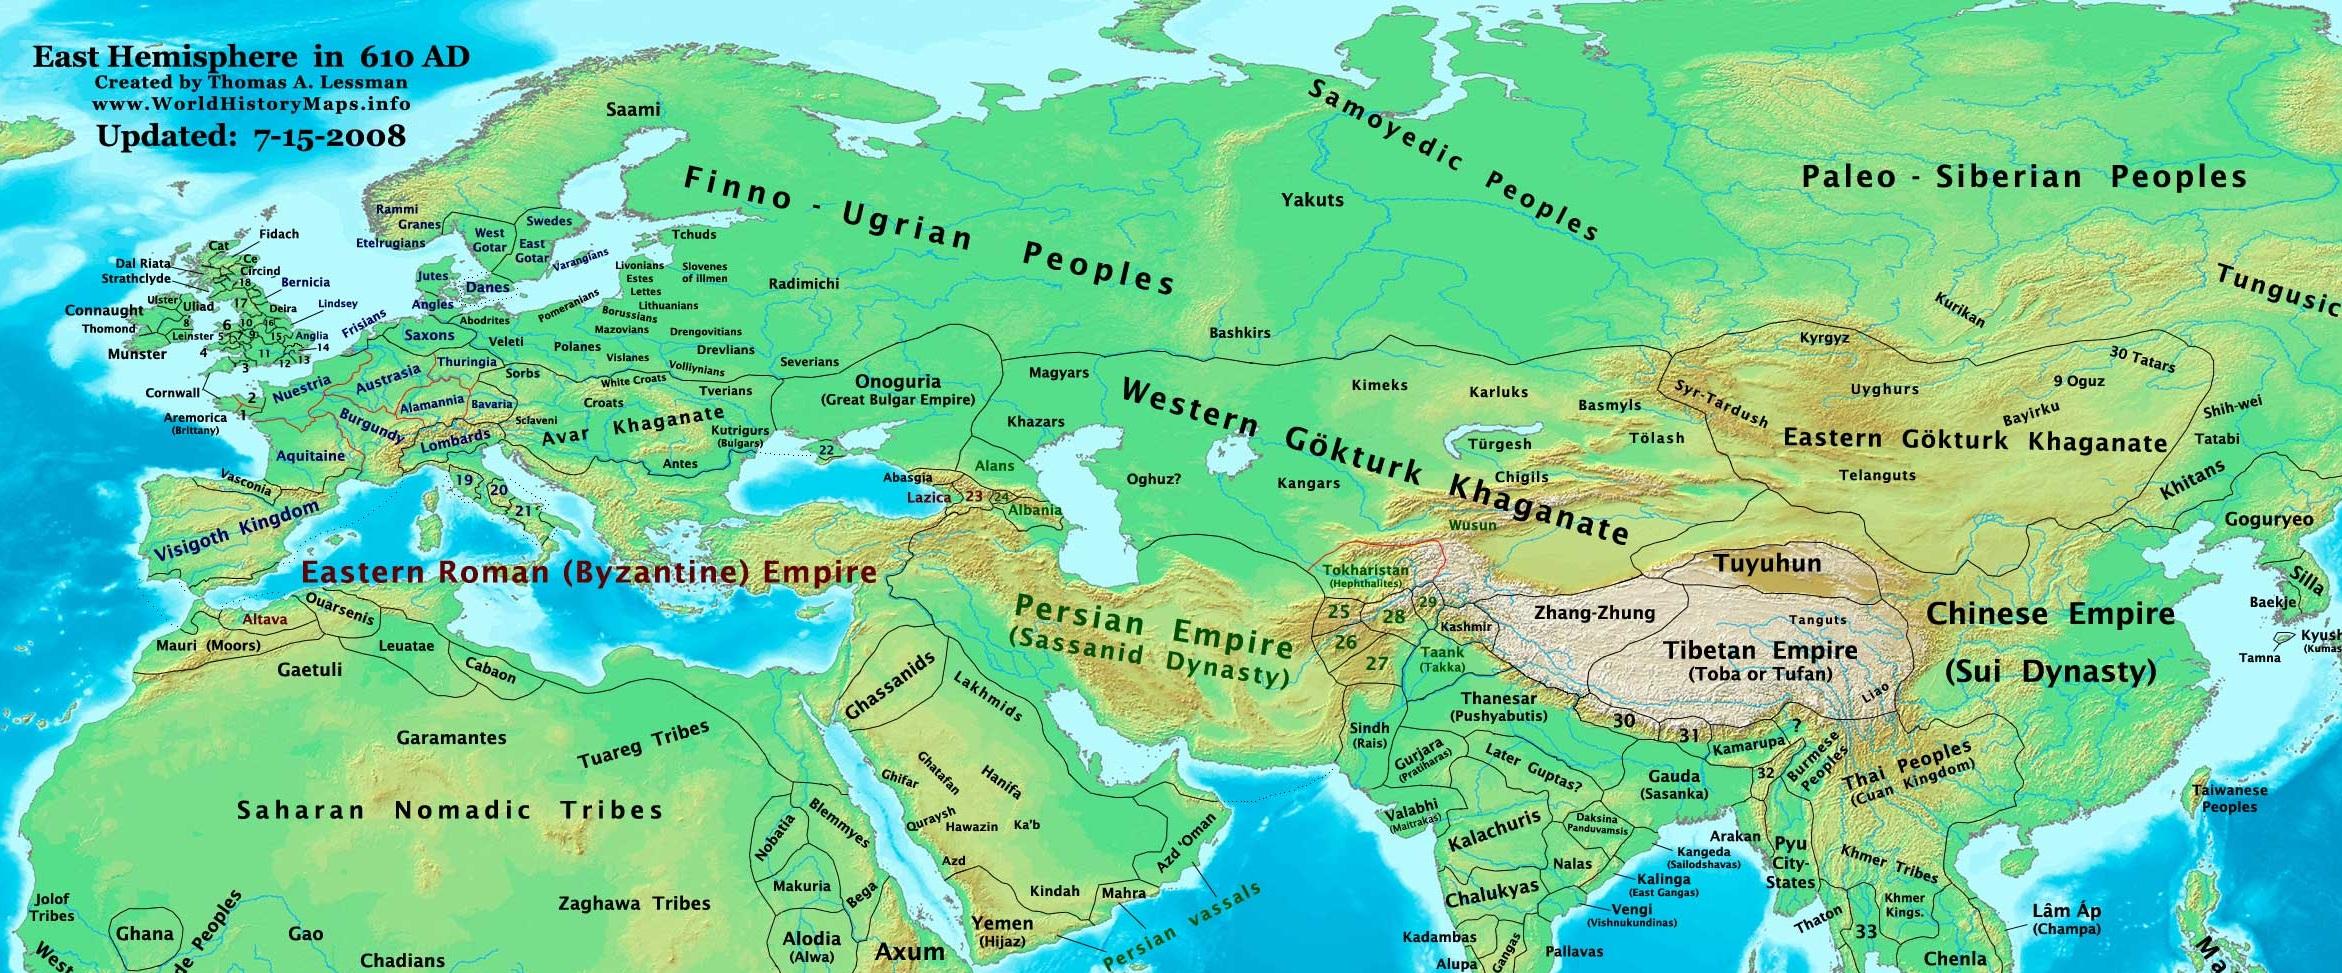 610 AD